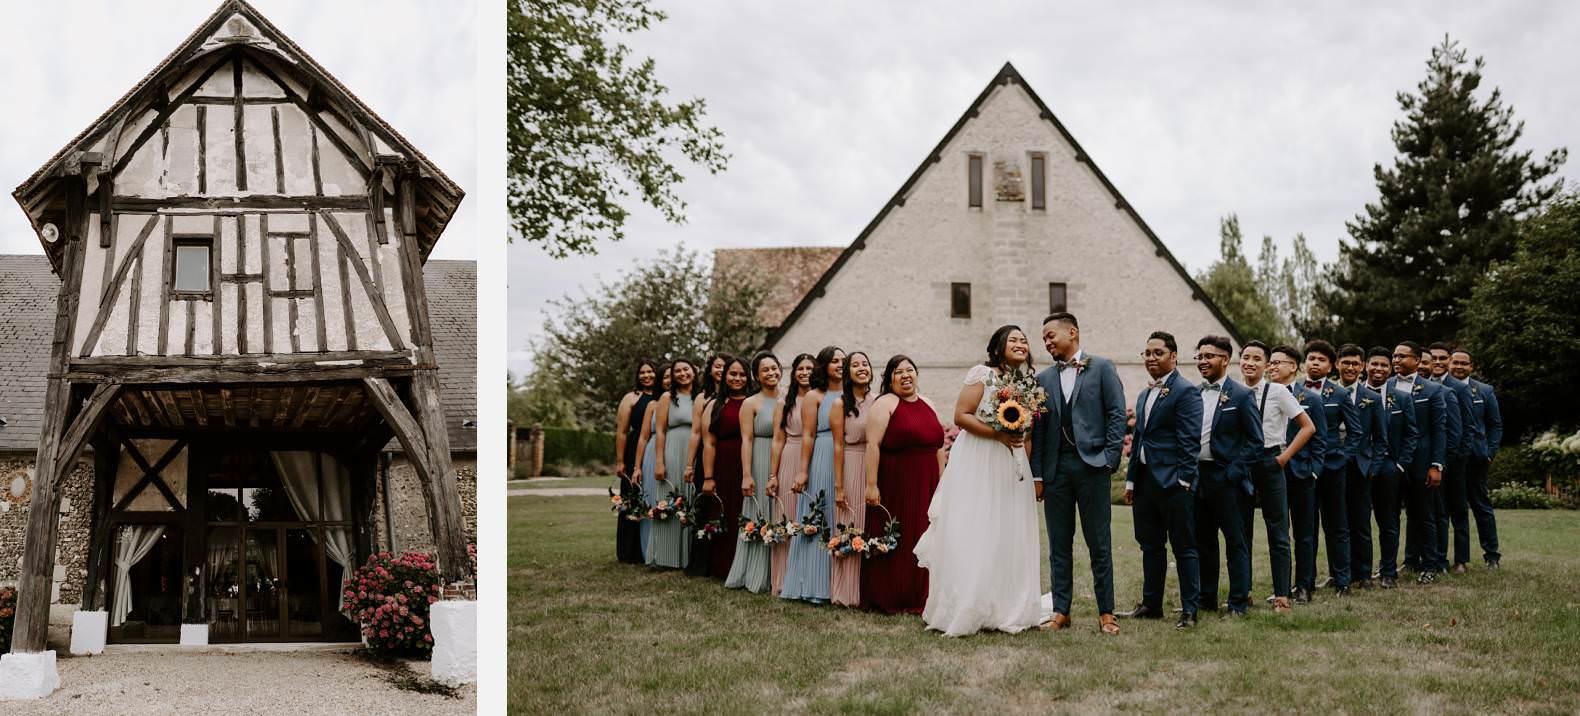 mariage manoir de corny photographe bel esprit 0046 1